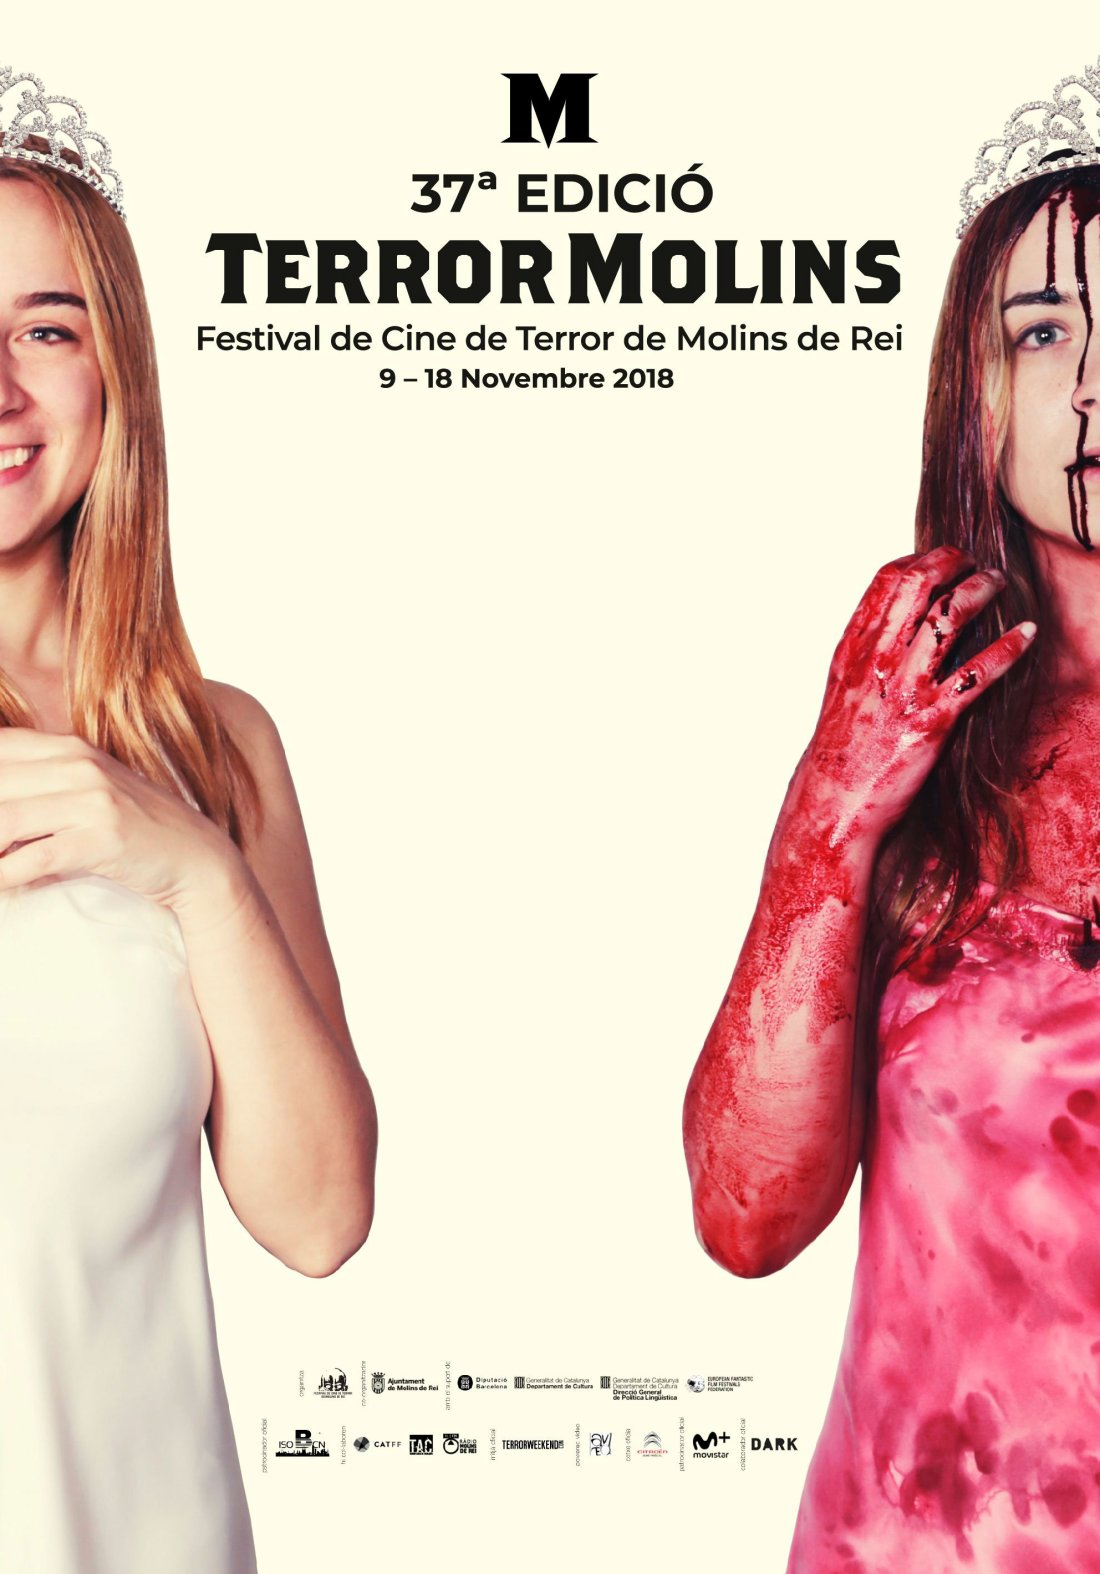 terrormolins-poster-2018